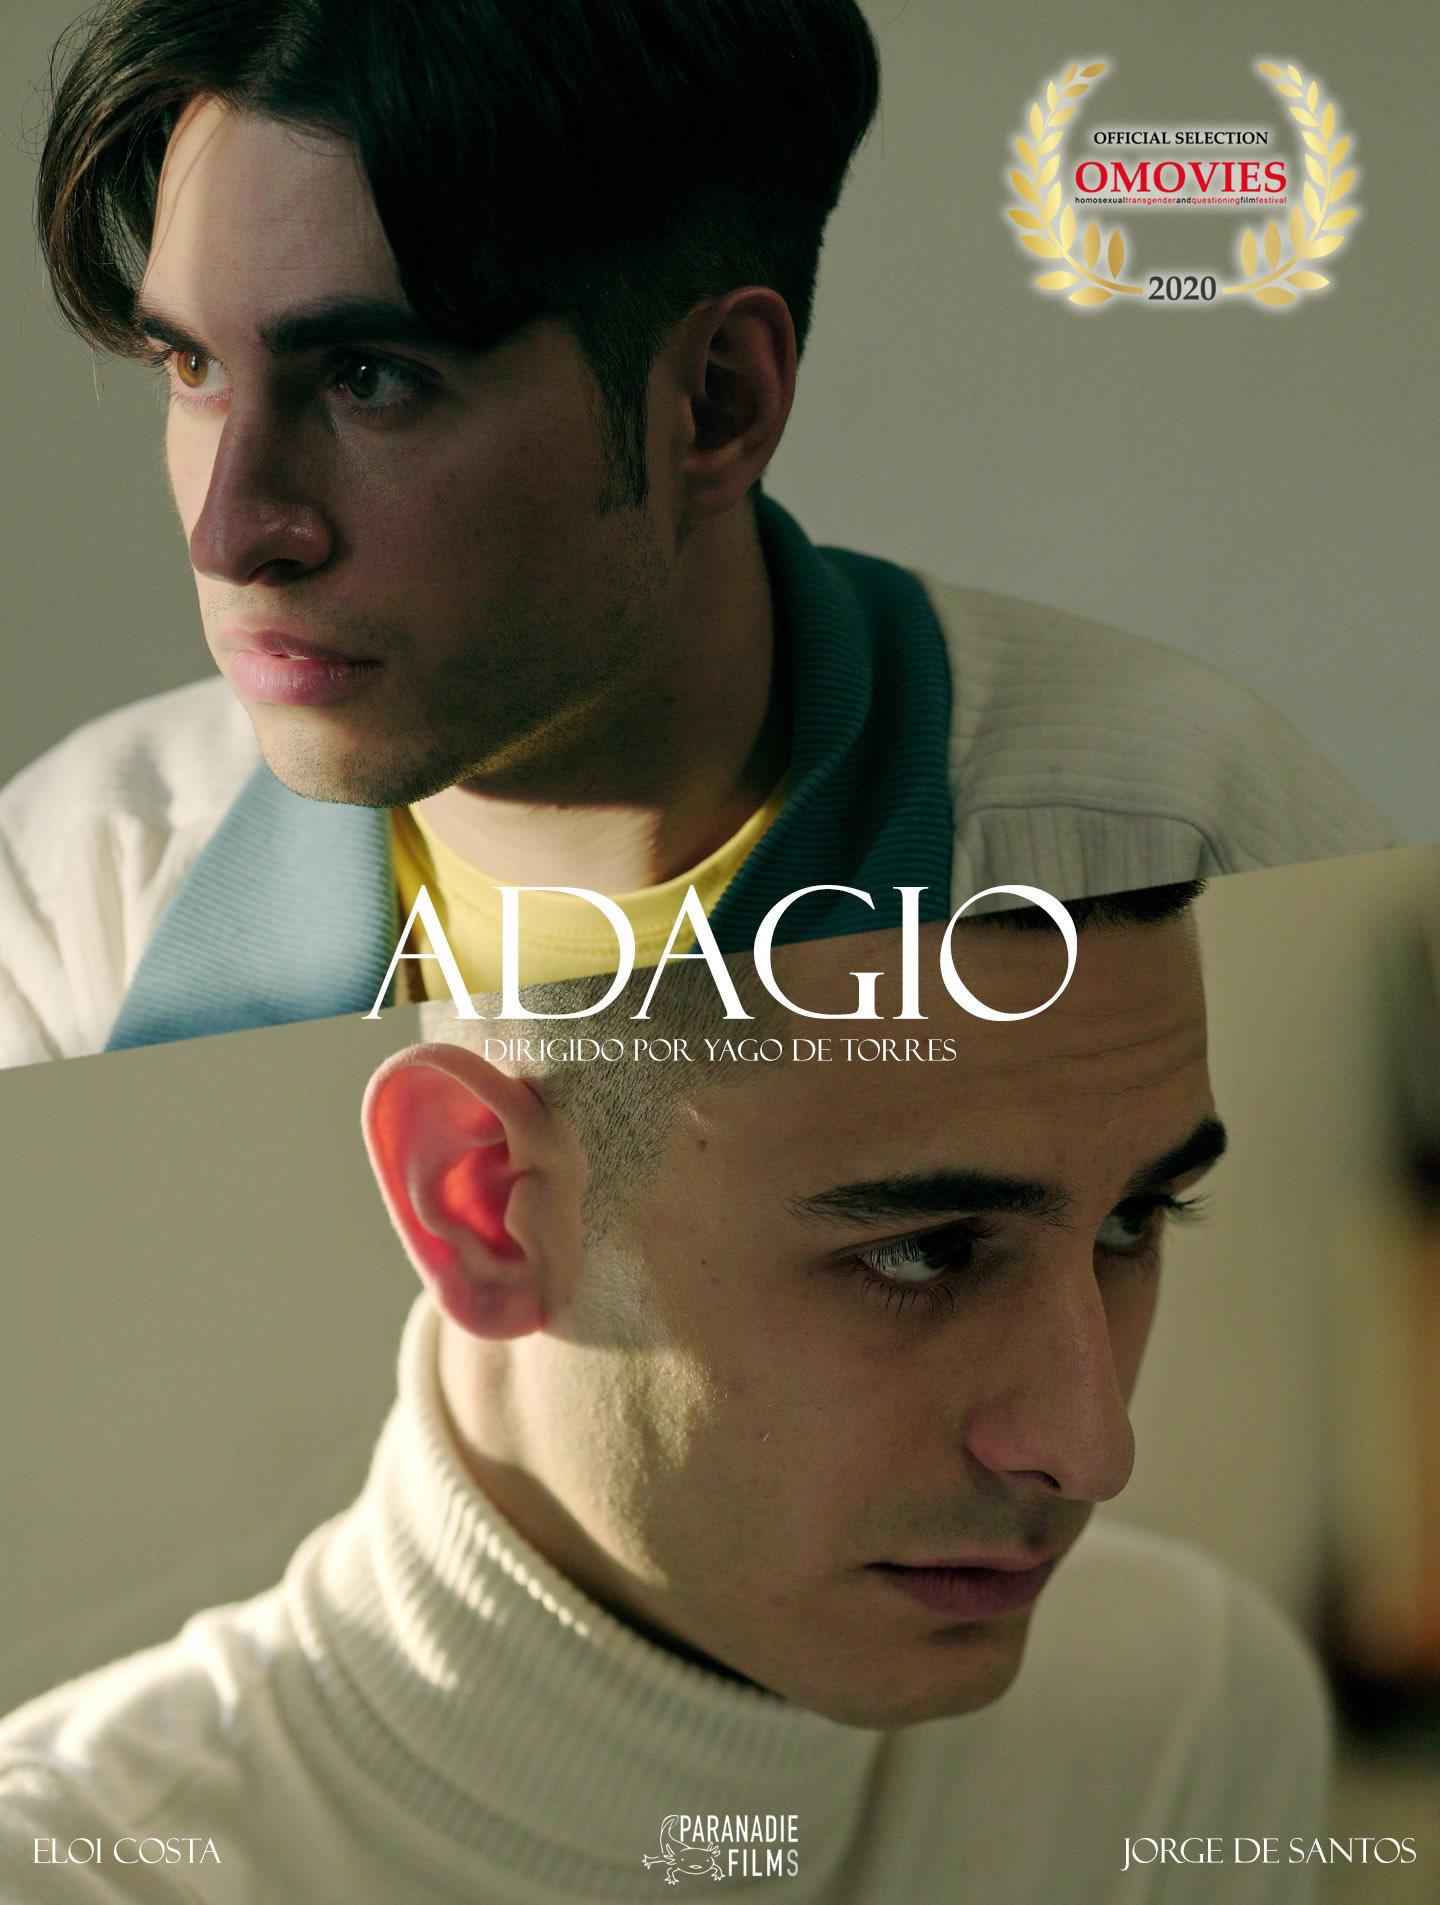 Adagio Director Yago de Torres 20 Dec